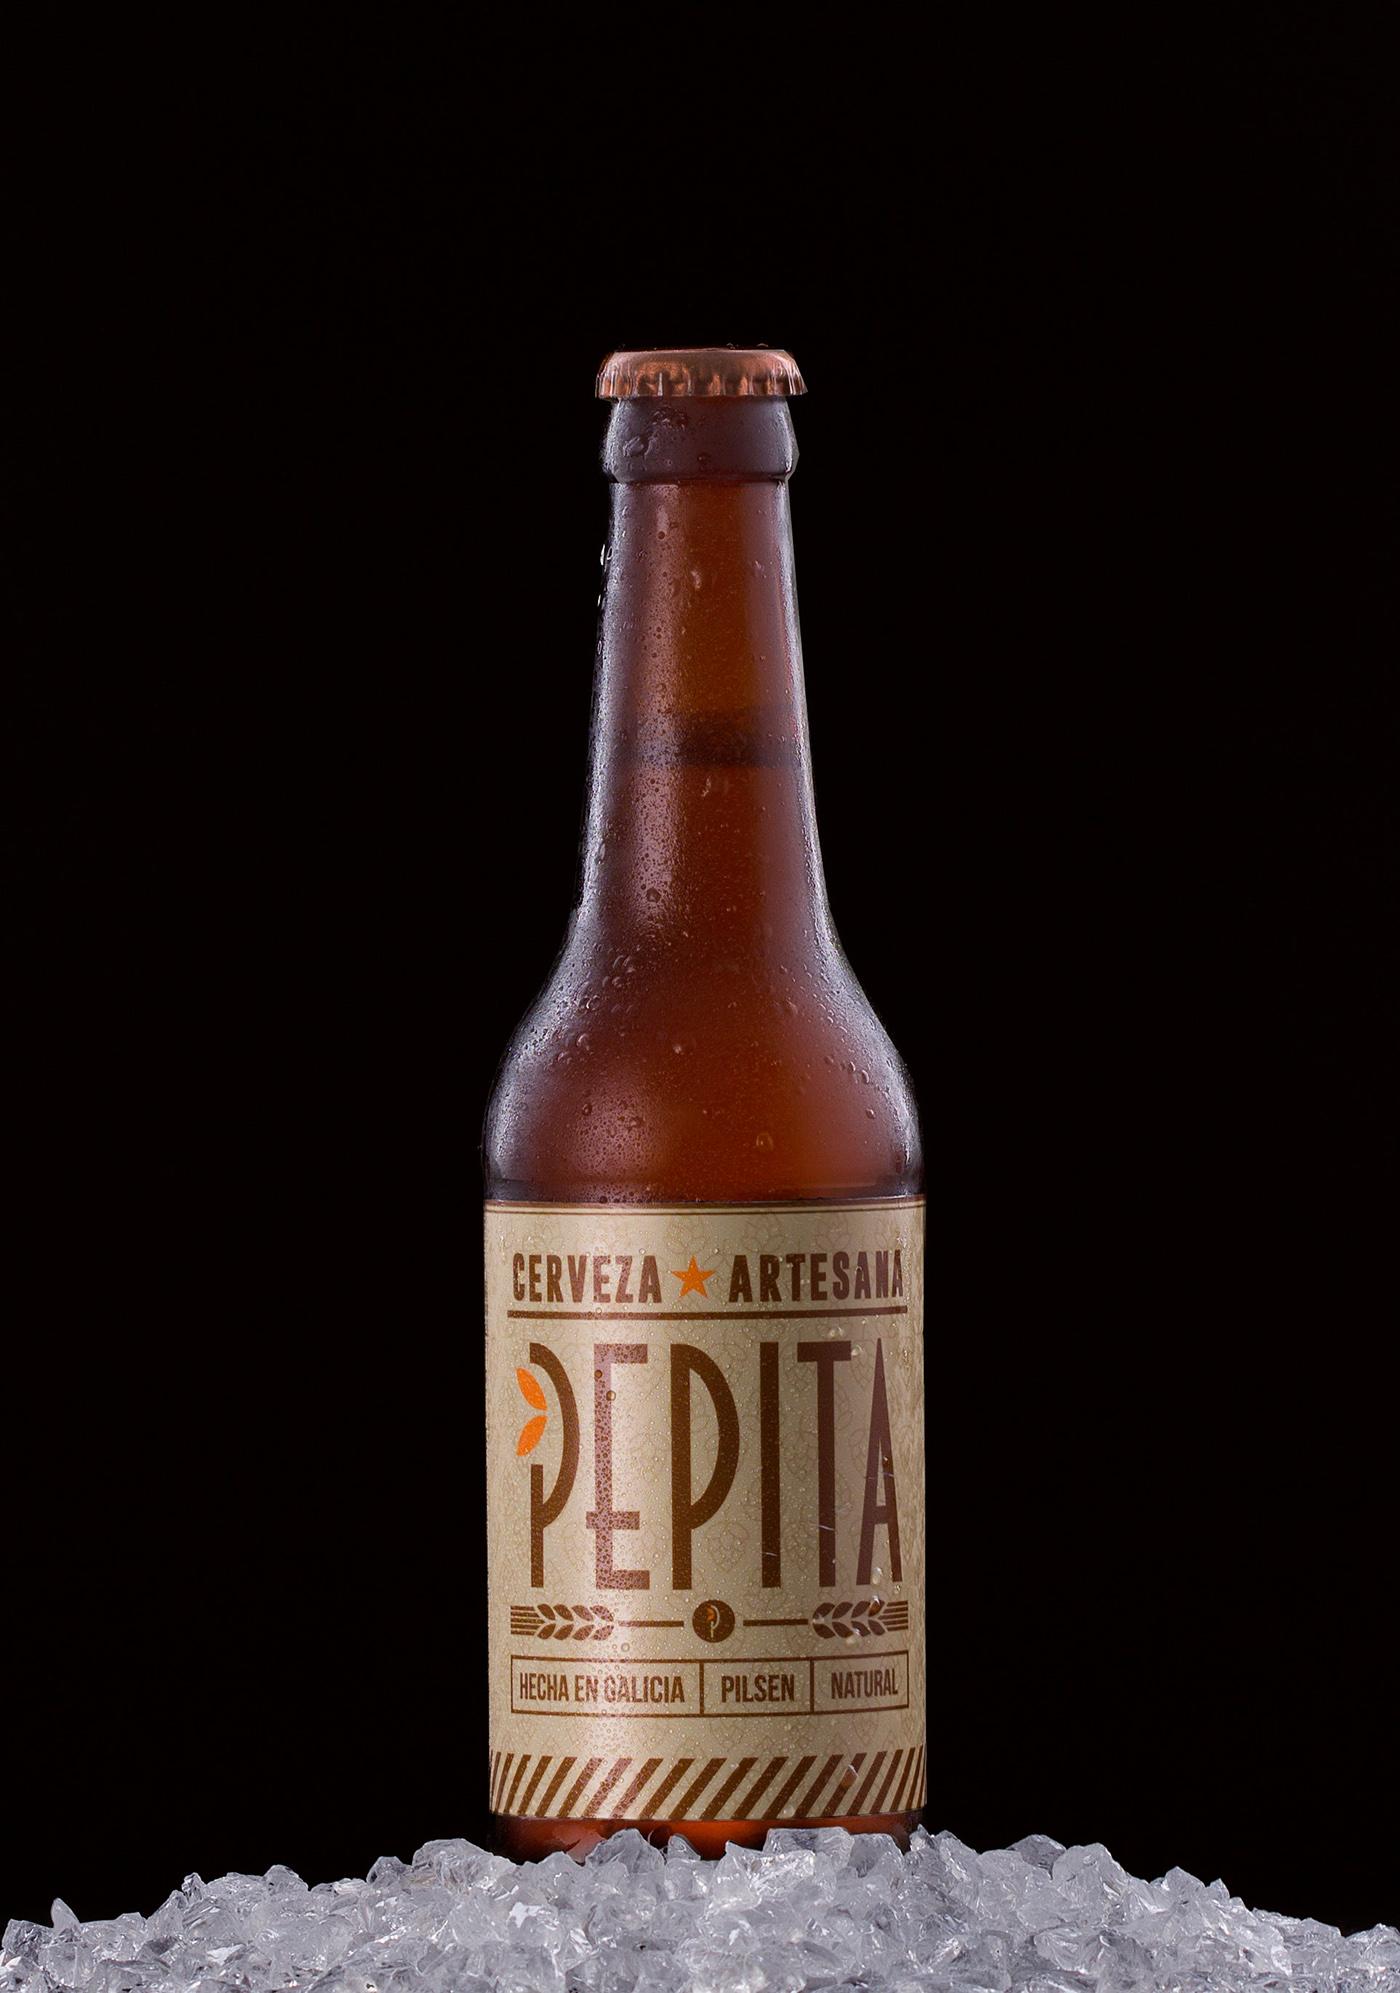 fotógrafo de botellas Galicia